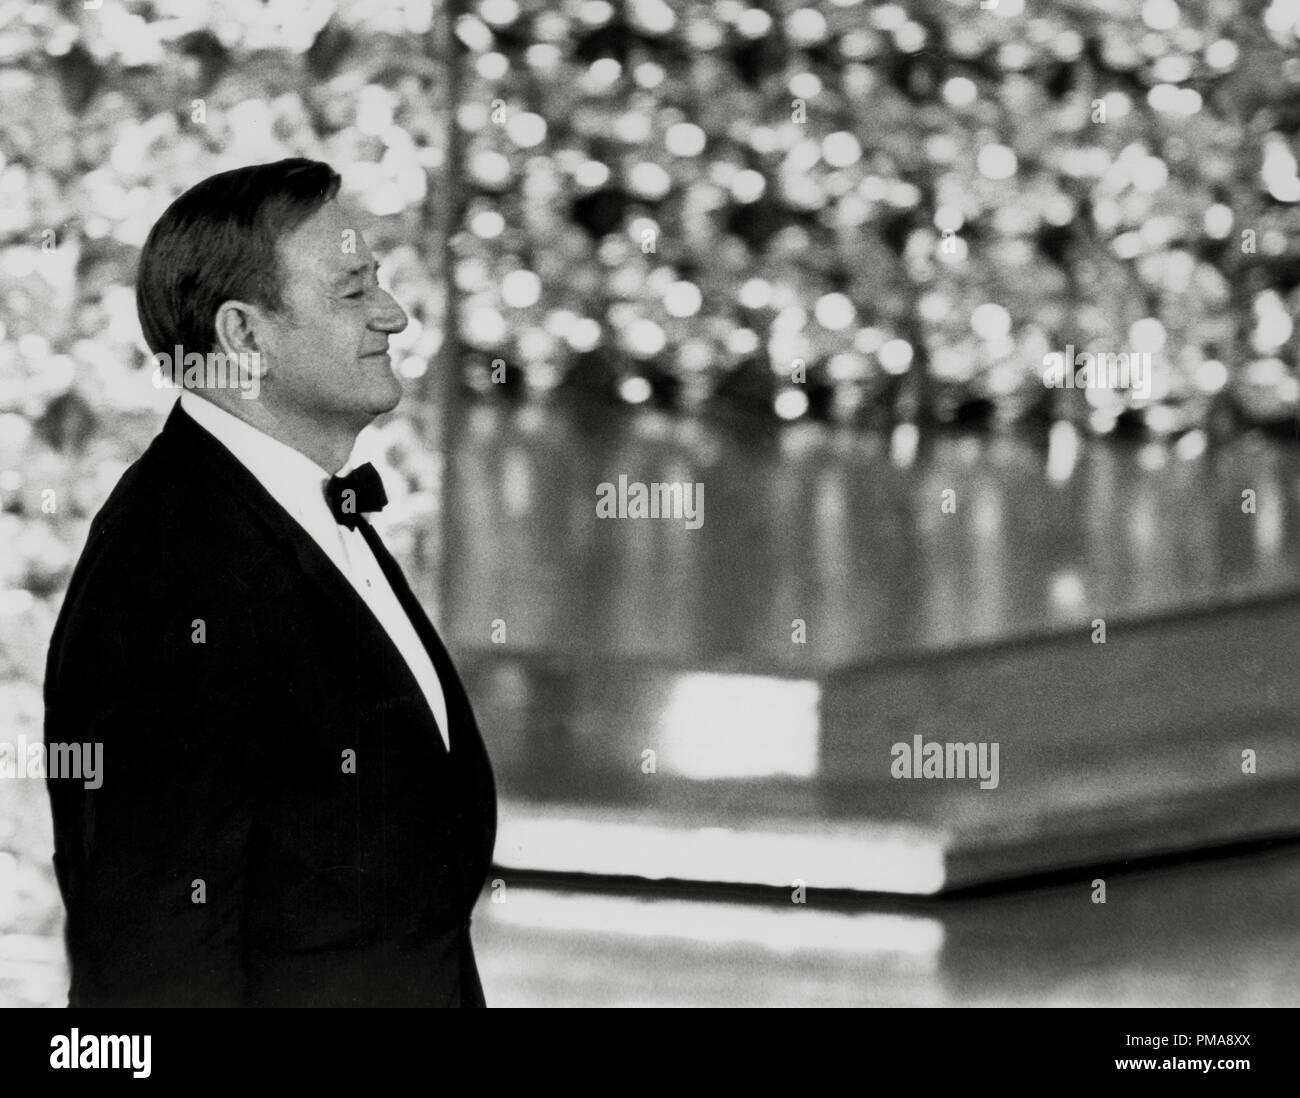 John Wayne at the 42nd Annual Academy Awards, 1970  File Reference # 31955_686THA - Stock Image